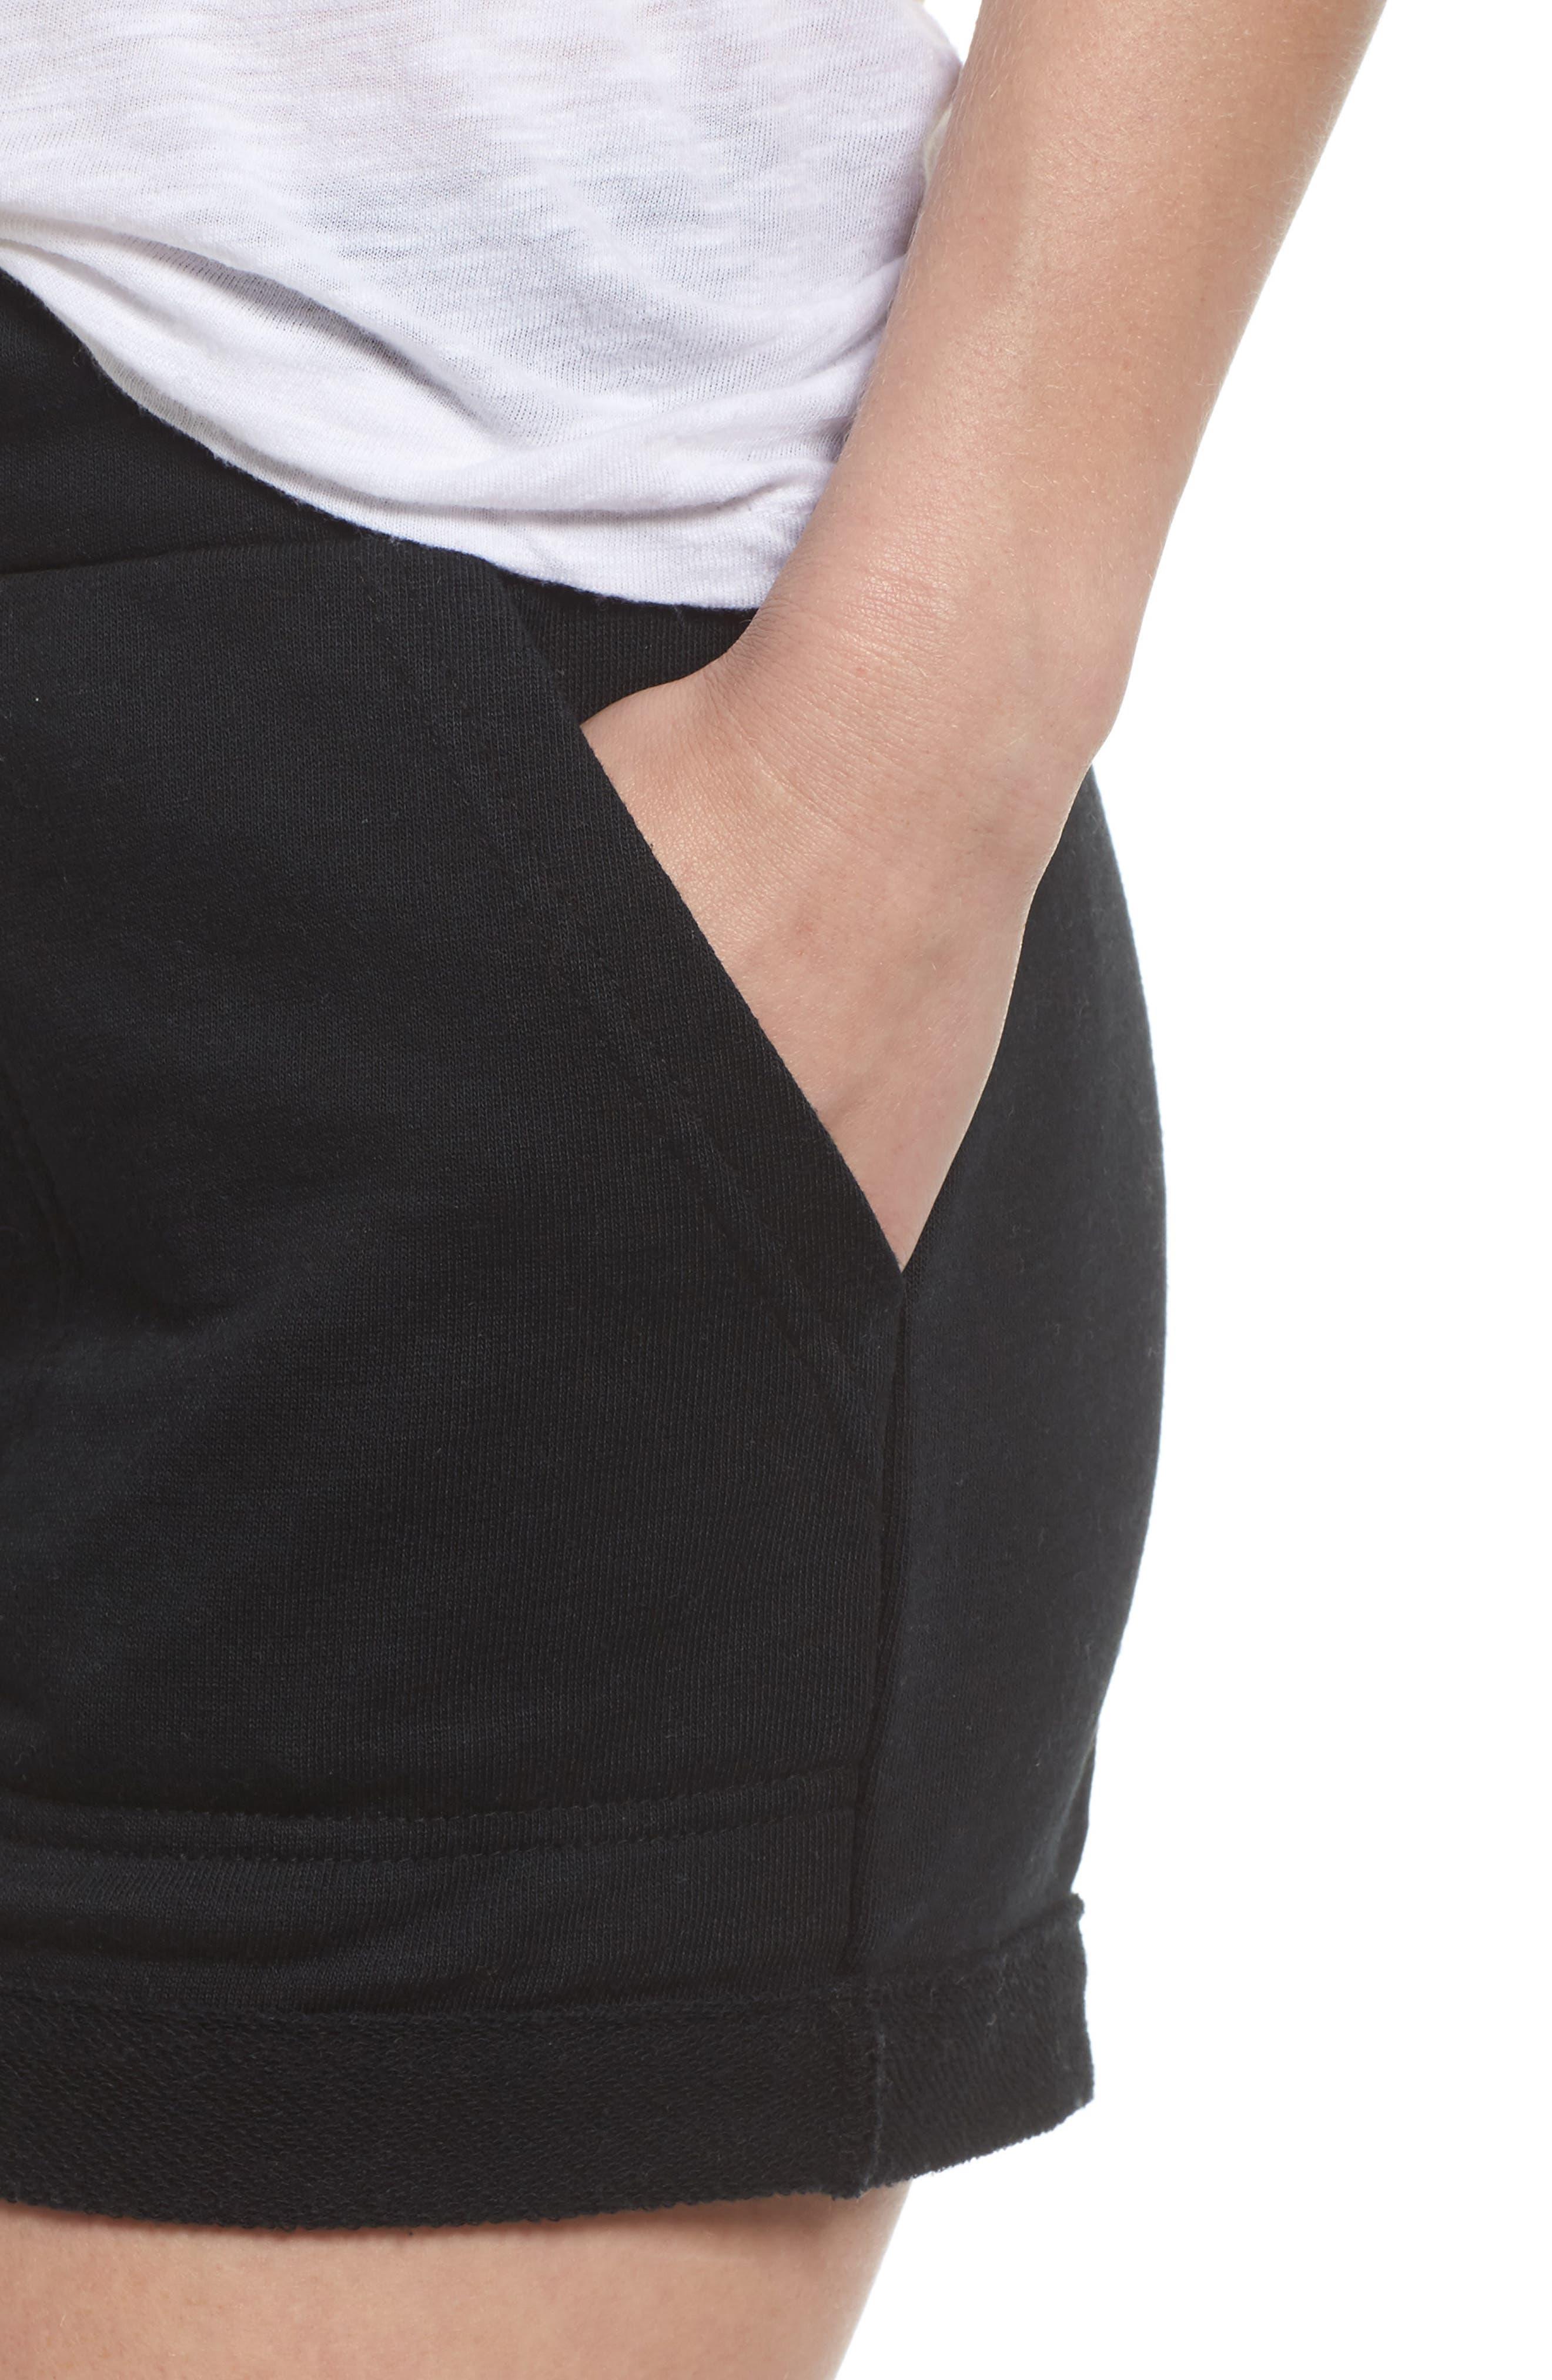 Lounge Shorts,                             Alternate thumbnail 4, color,                             003